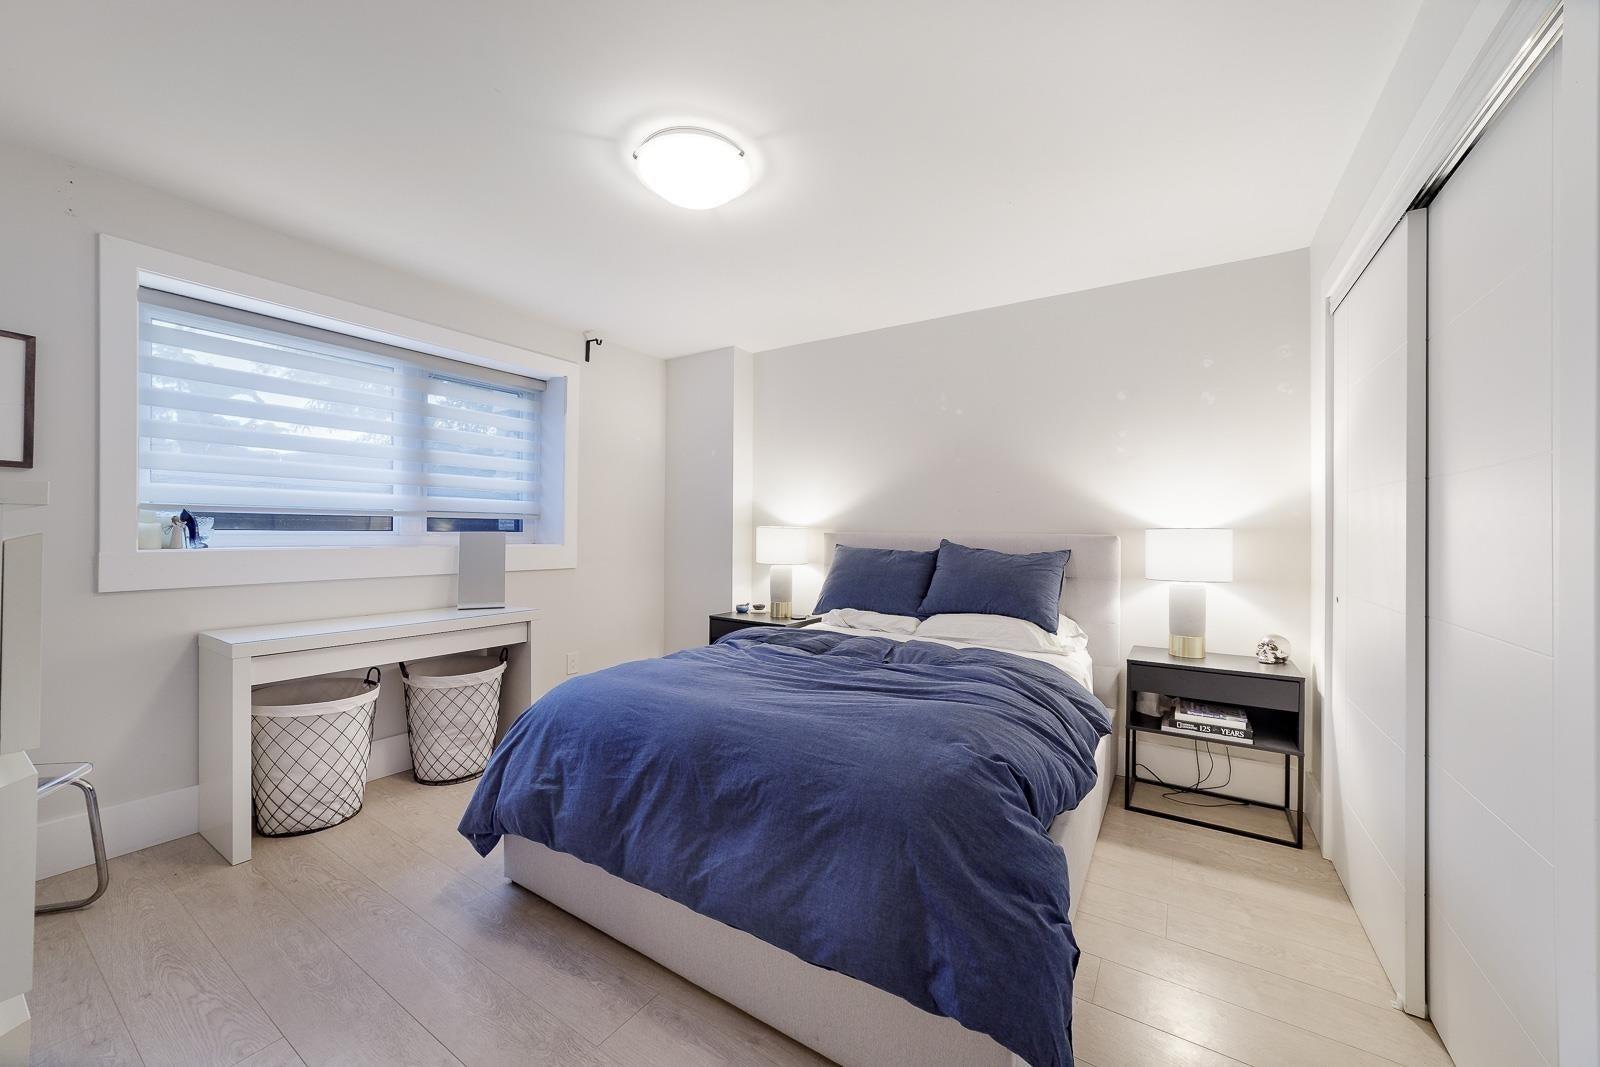 517 GRANADA CRESCENT - Upper Delbrook House/Single Family for sale, 8 Bedrooms (R2615057) - #30